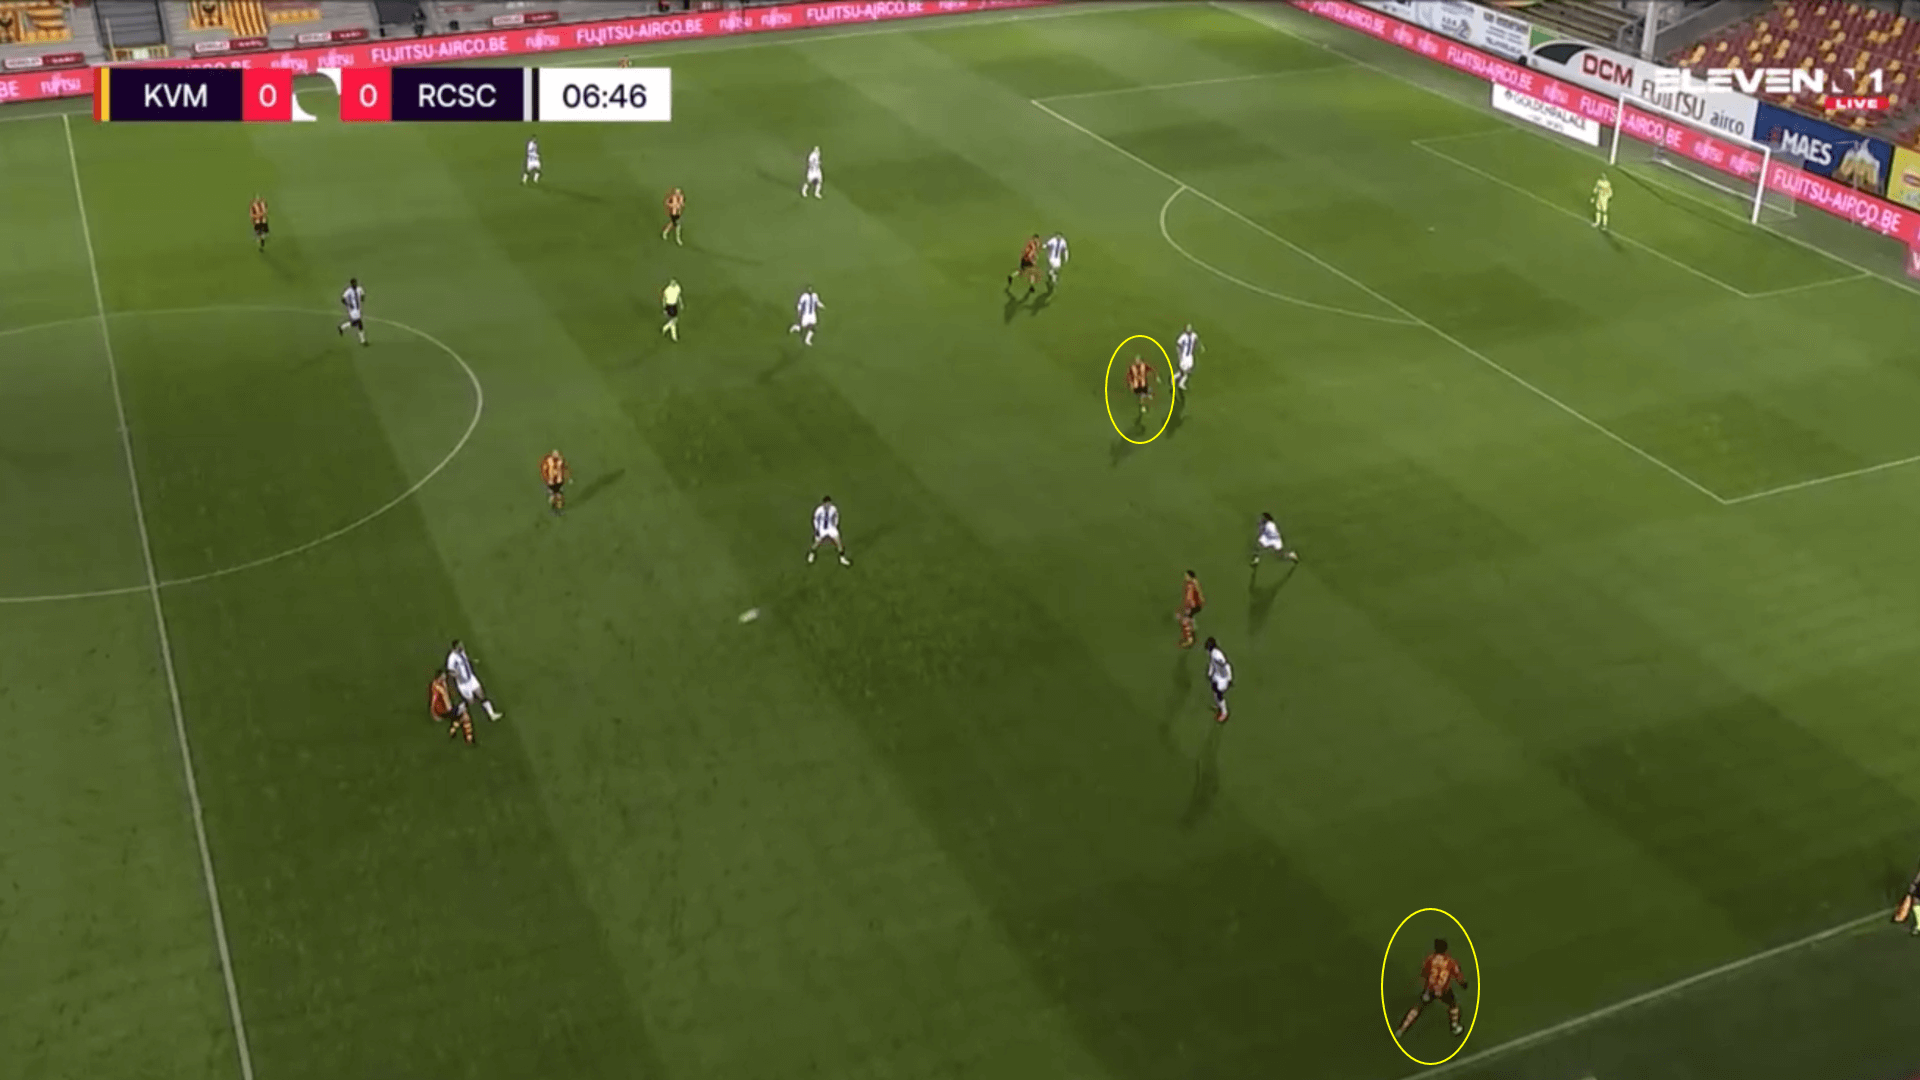 Belgian Pro League 2020/21 - KV Mechelen v R. Charleroi - tactical analysis tactics